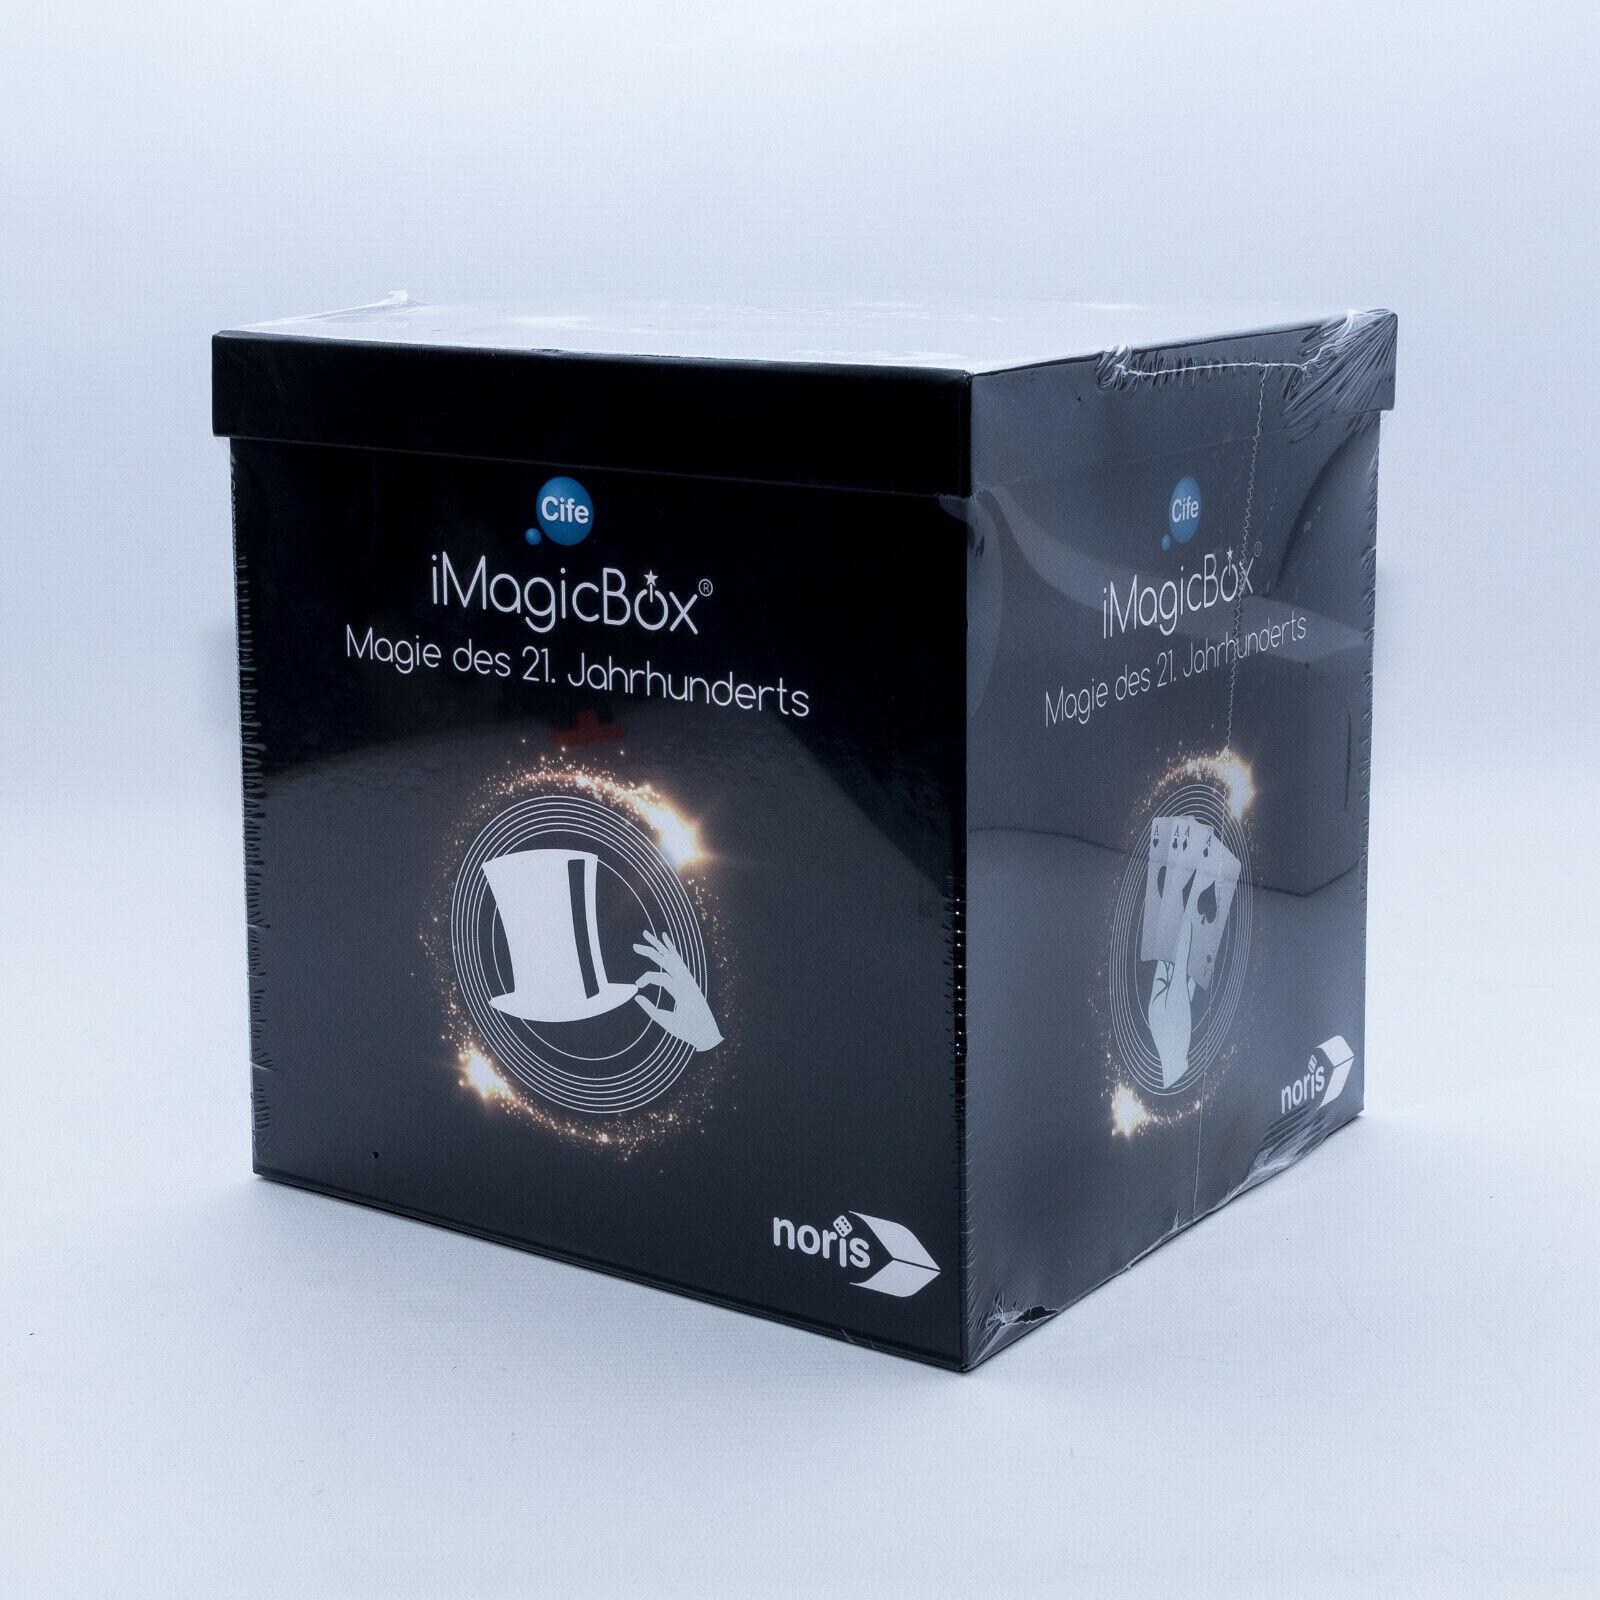 Noris Zauberkasten 6063217589 - iMagicBox - Magie des 21. Jahrhunderts NEU   OVP